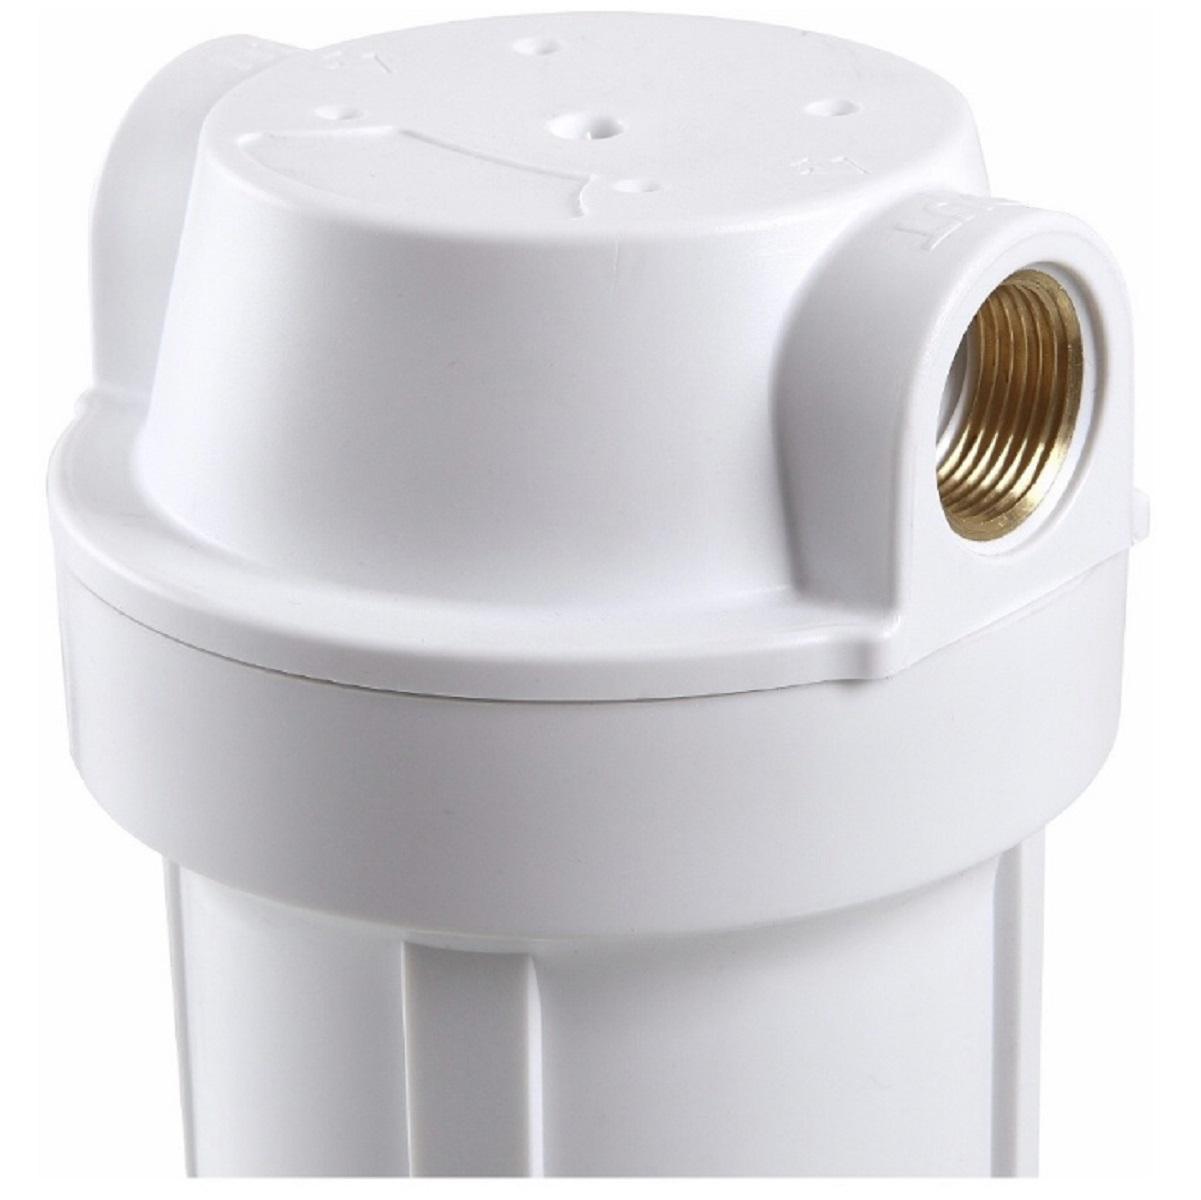 Filtro de água de Entrada de Caixa Dágua Duplo Polipropileno Plissado 10 Branco